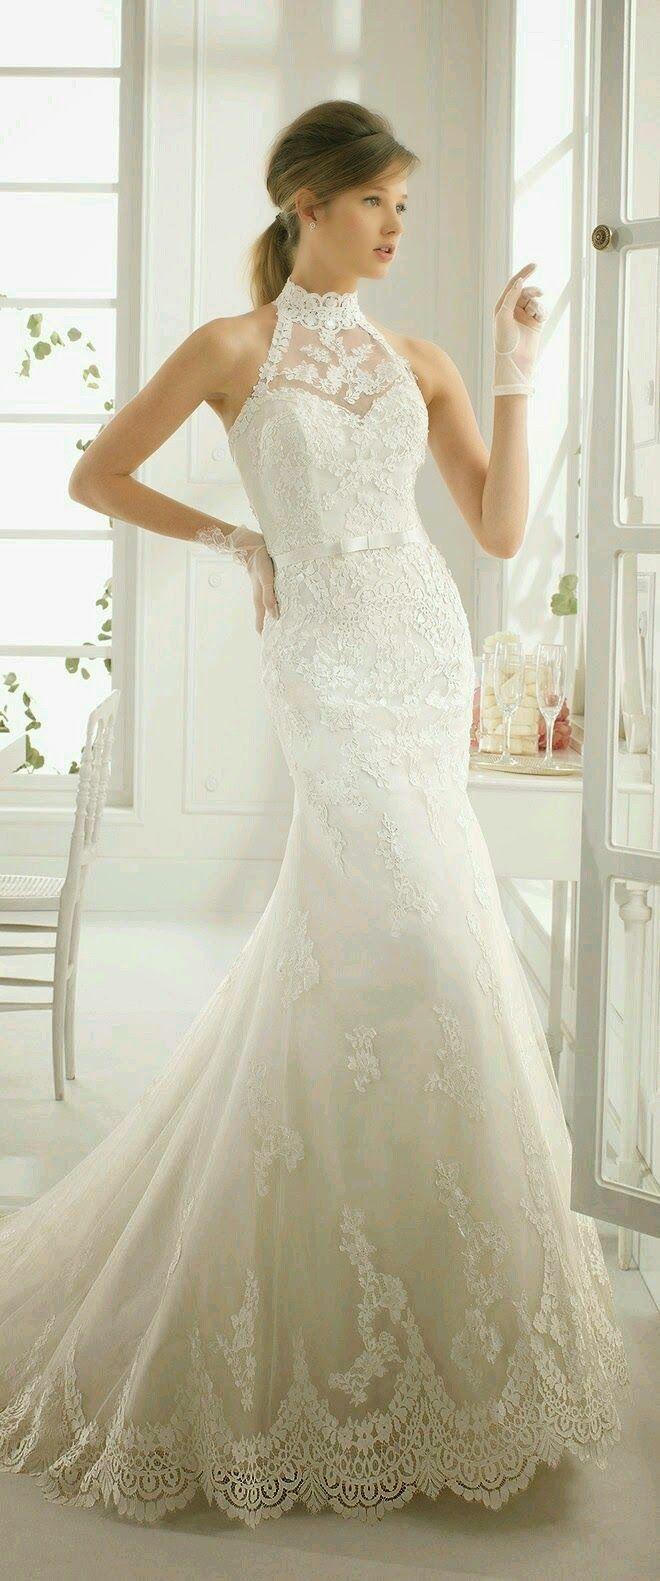 Vestidos de noiva vestidos de noiva modelo sereia vestidos de